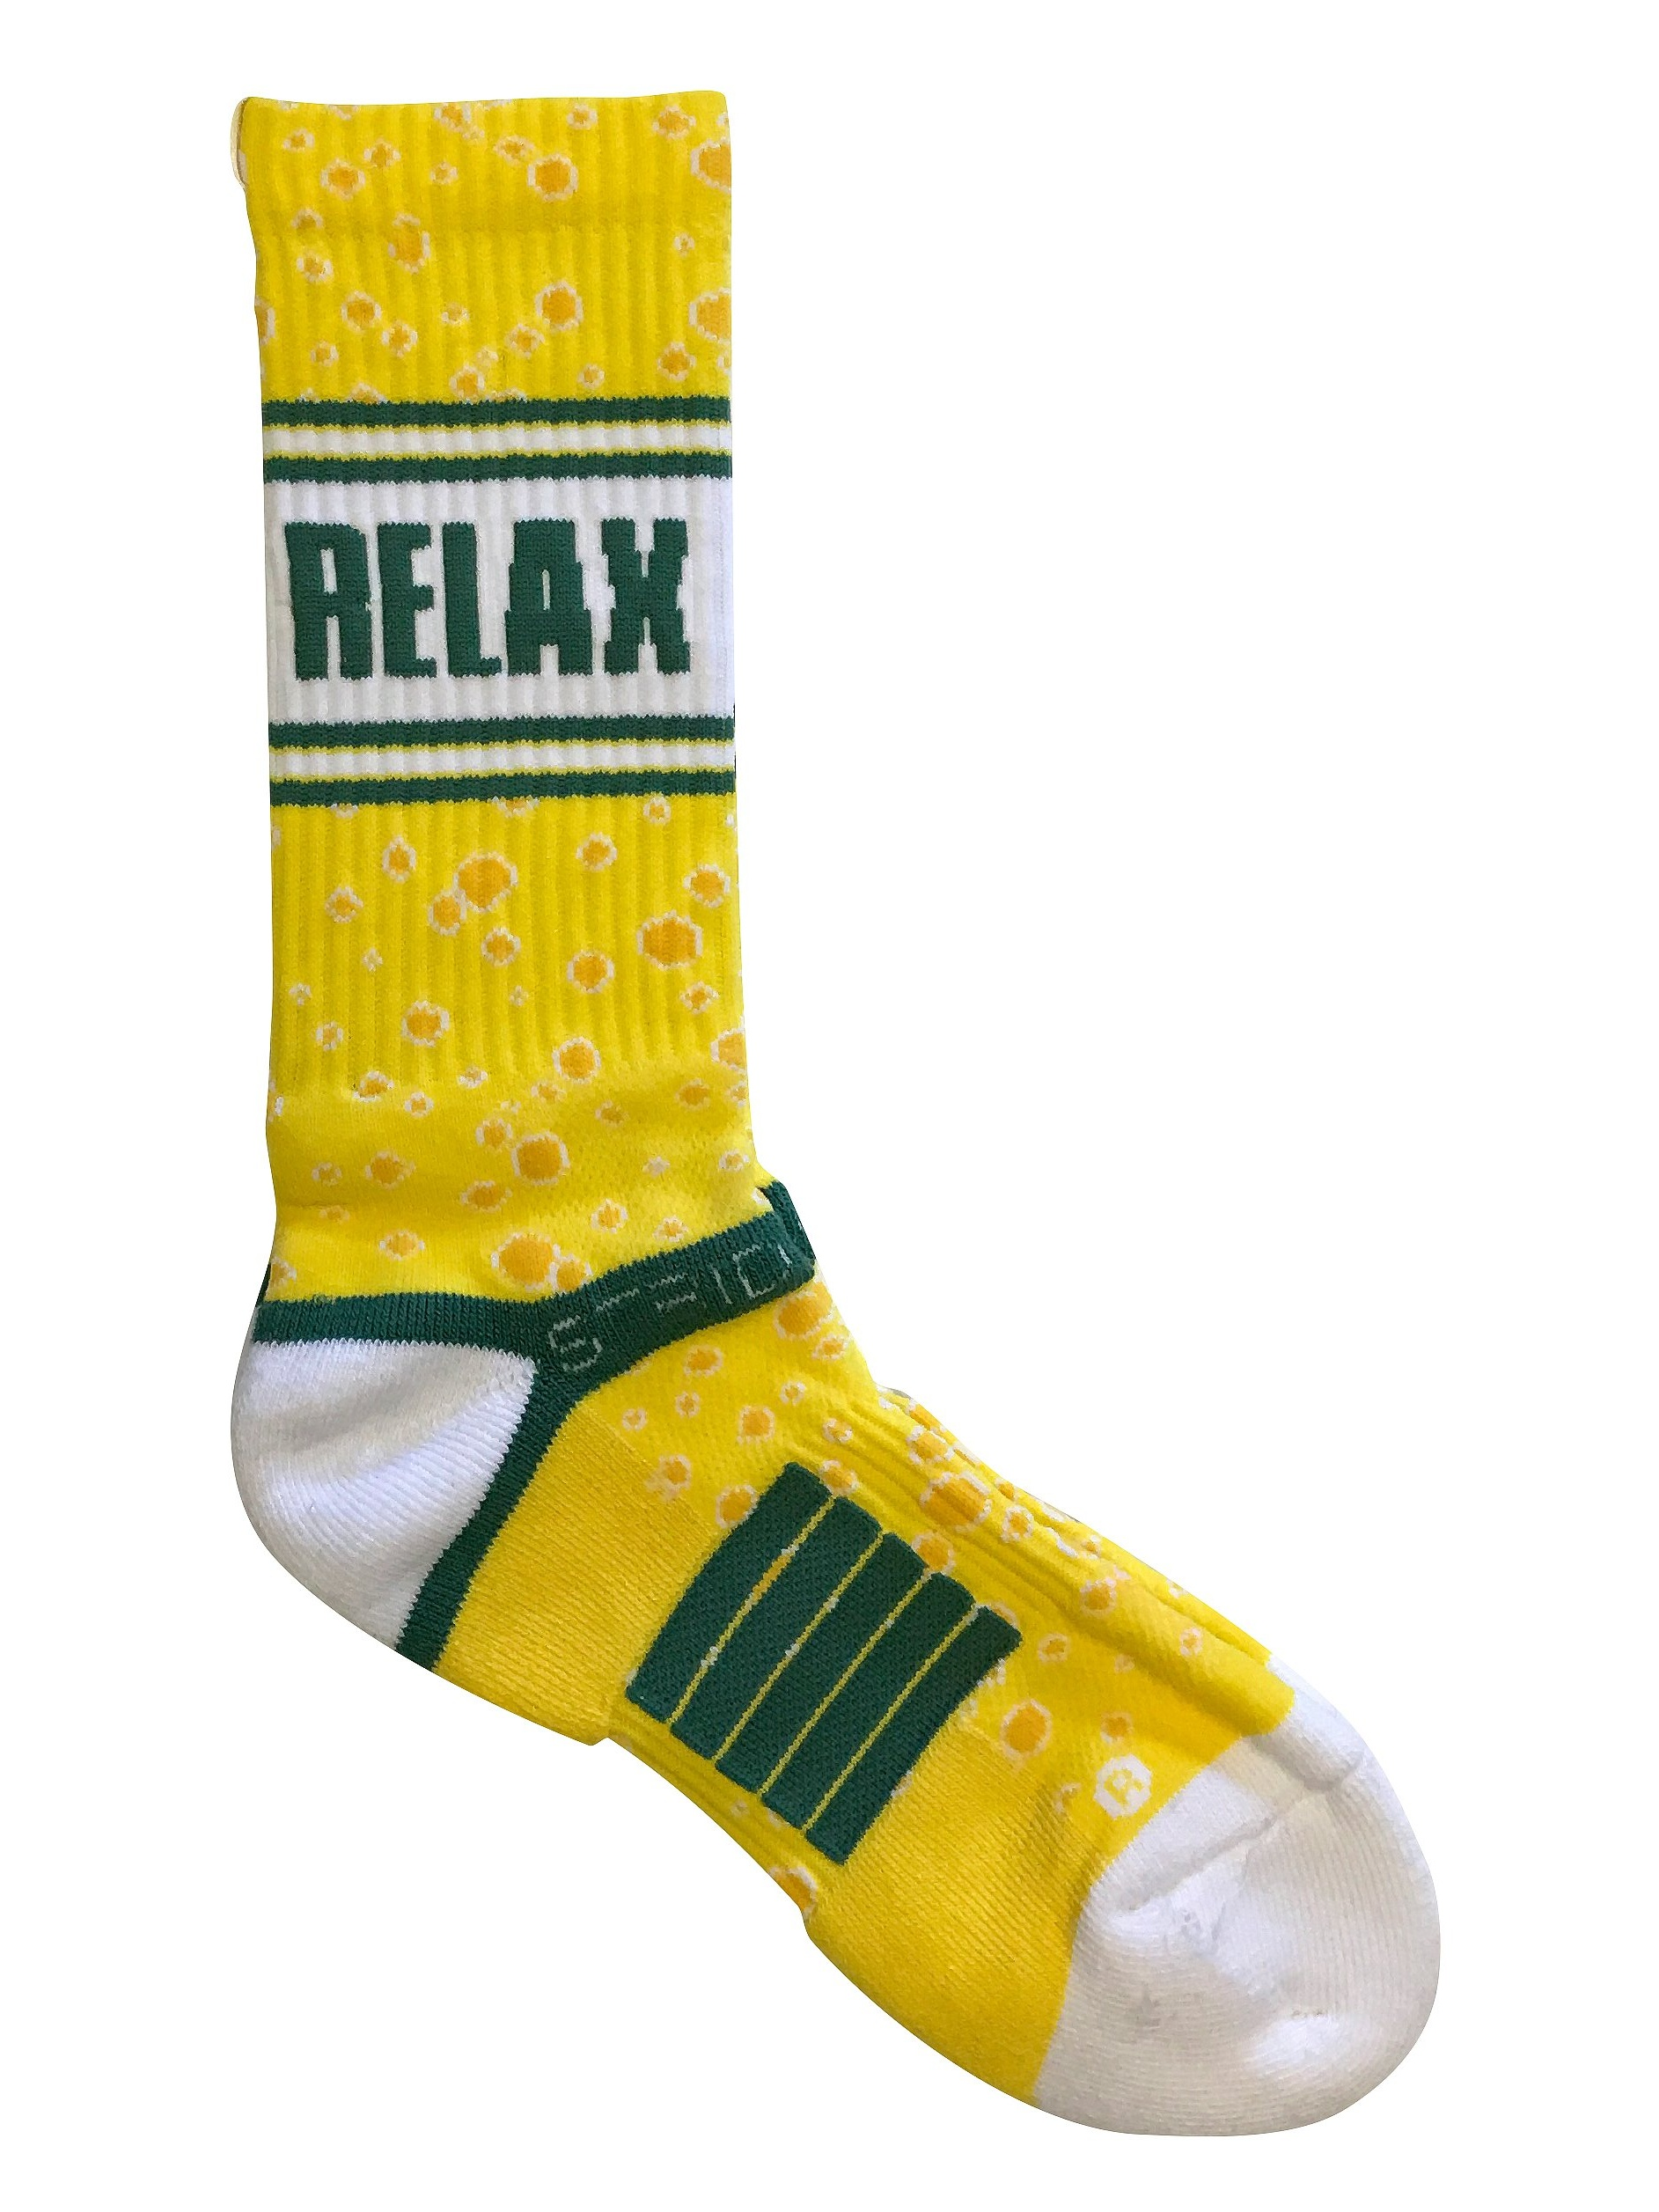 Strideline Green Bay, Relax Cheese Wisconsin Crew Socks